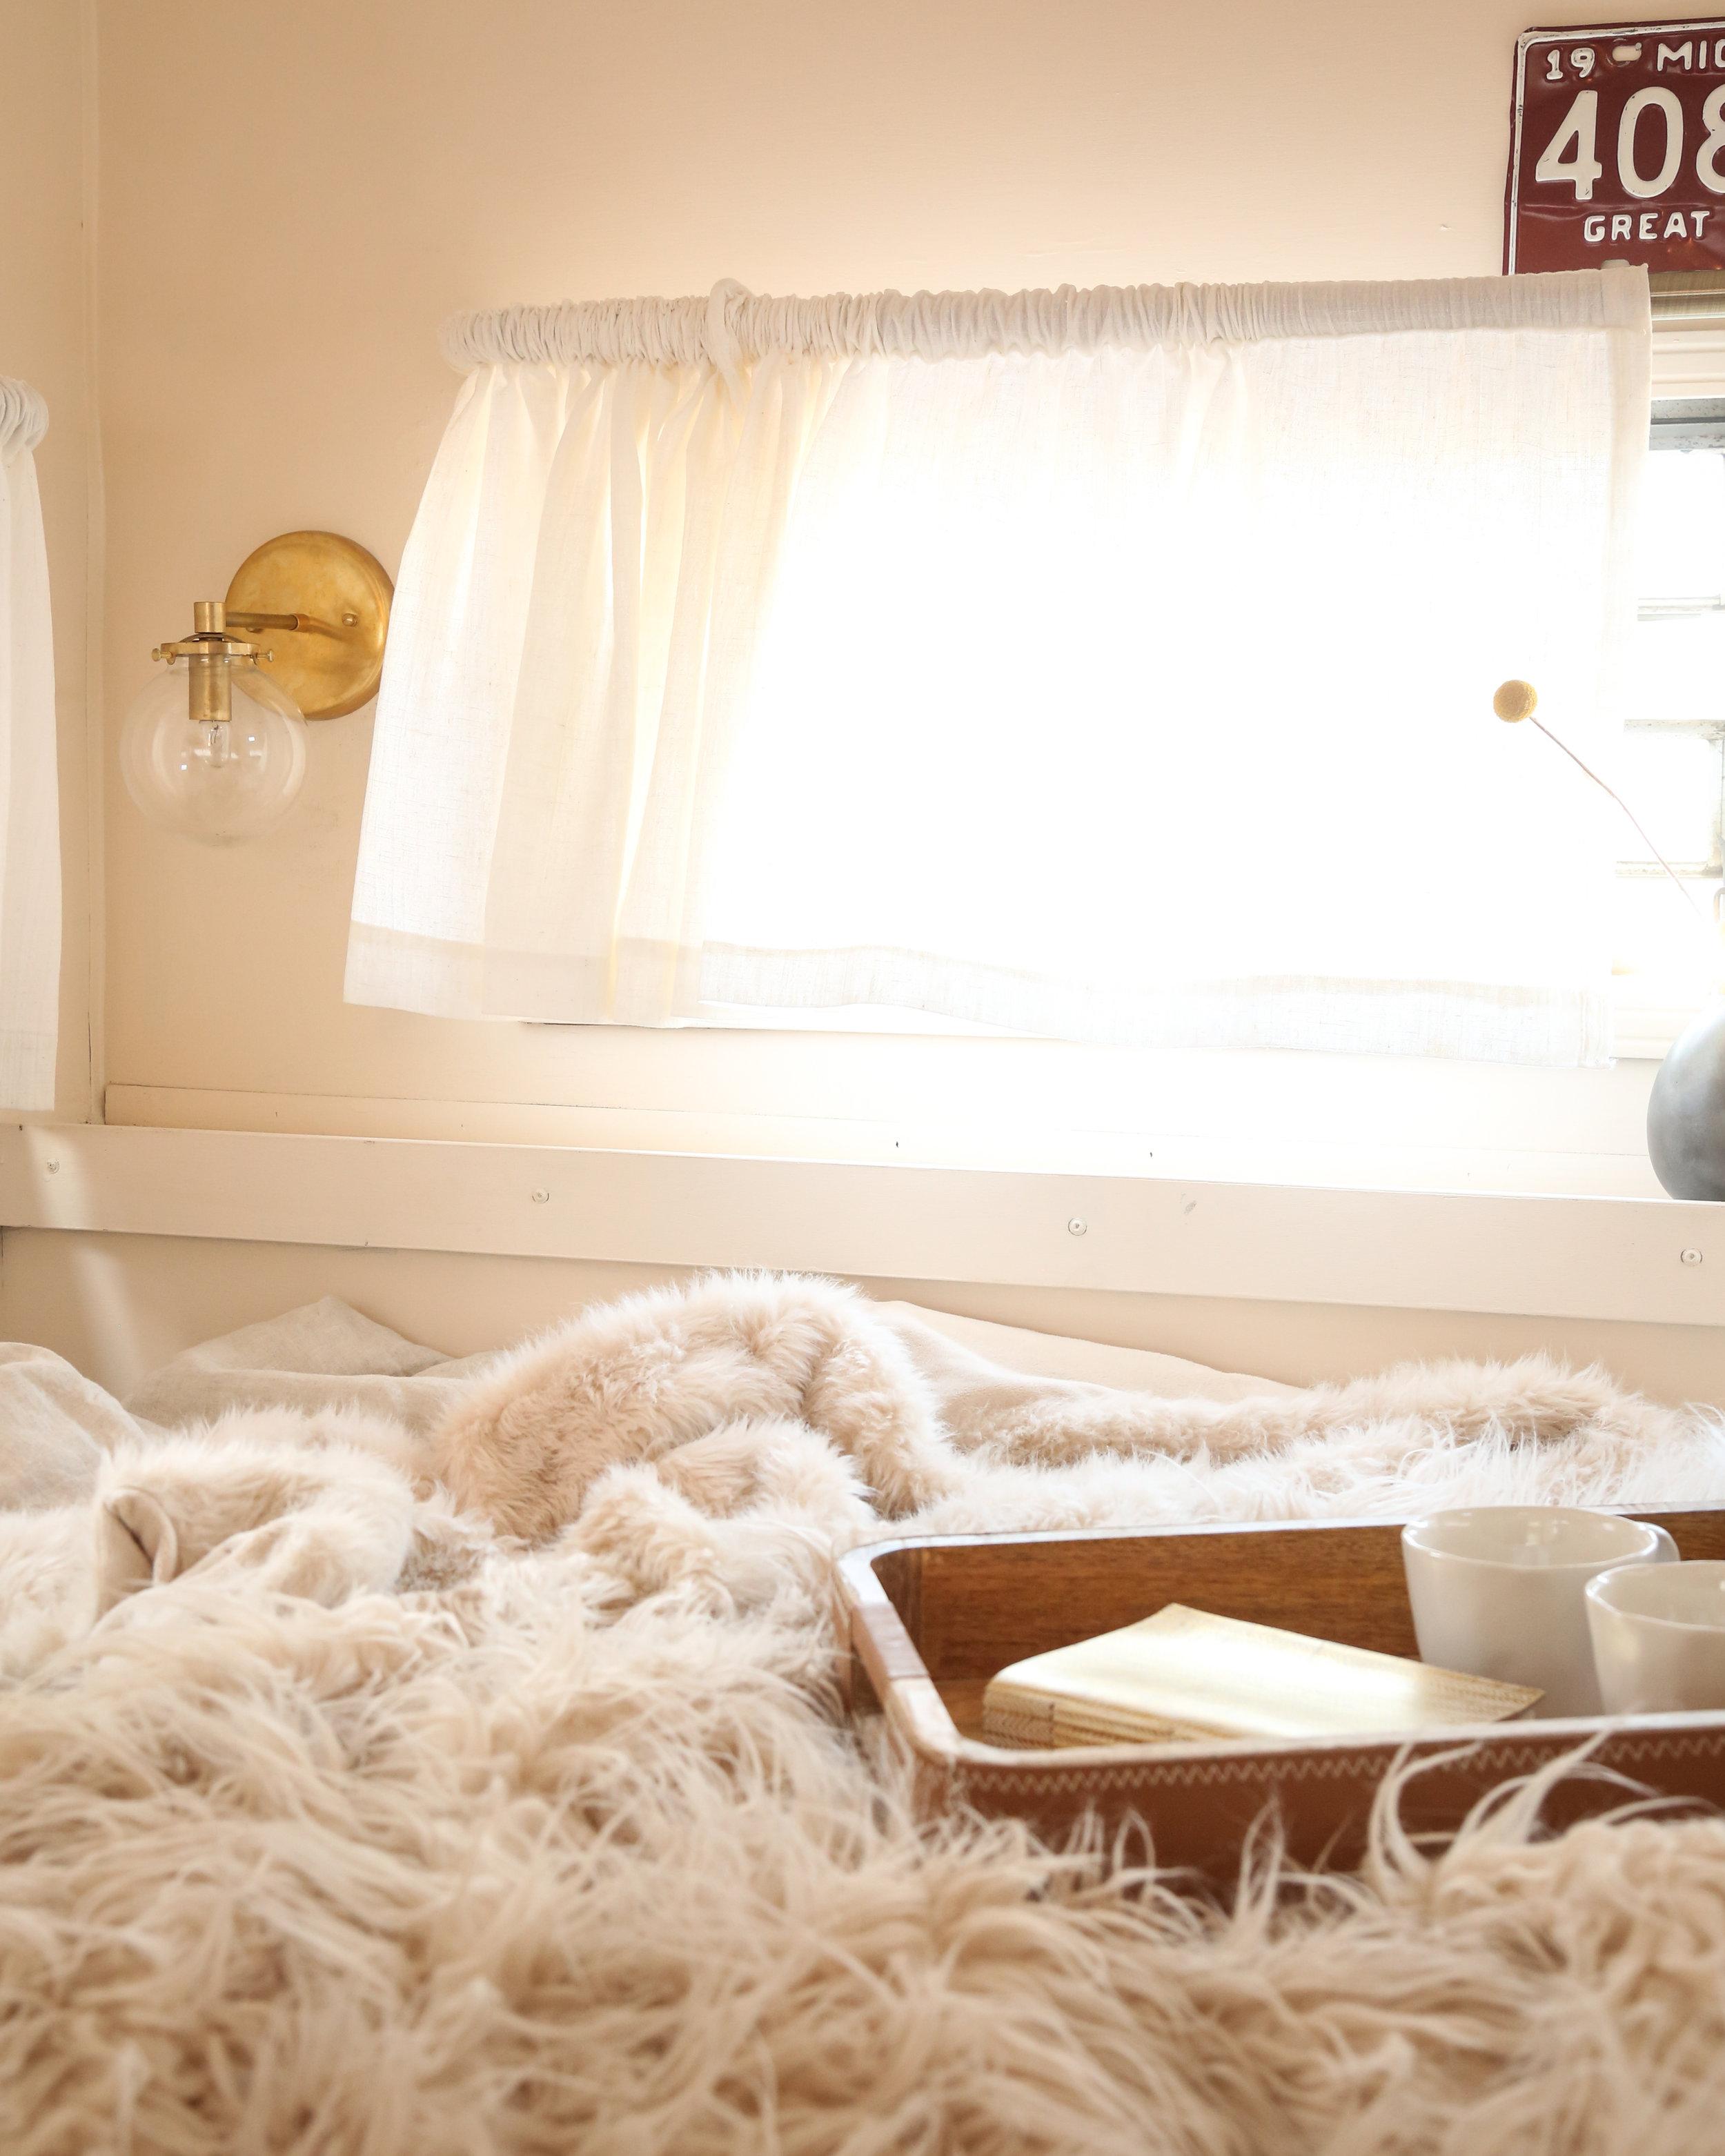 renovated vintage camper bedroom